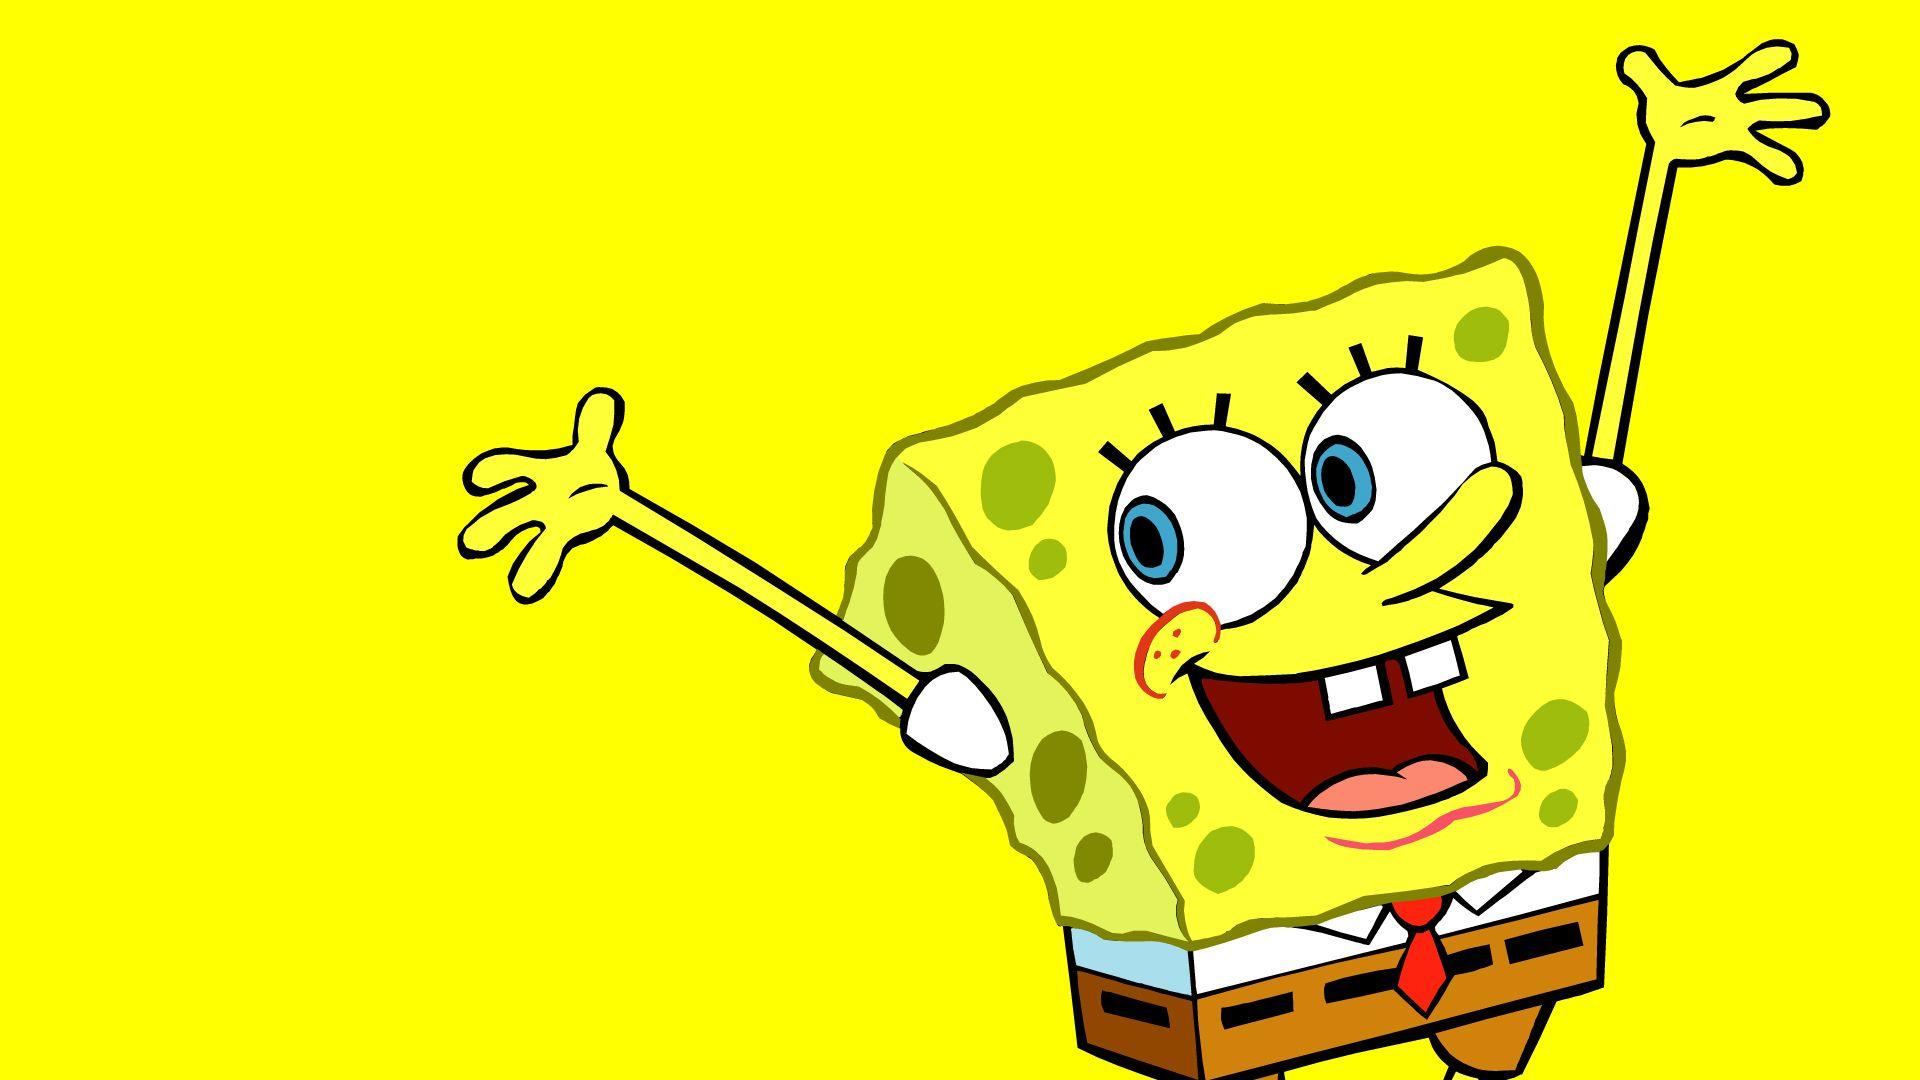 spongebob squarepants happy face wallpaper spongebob pinterest